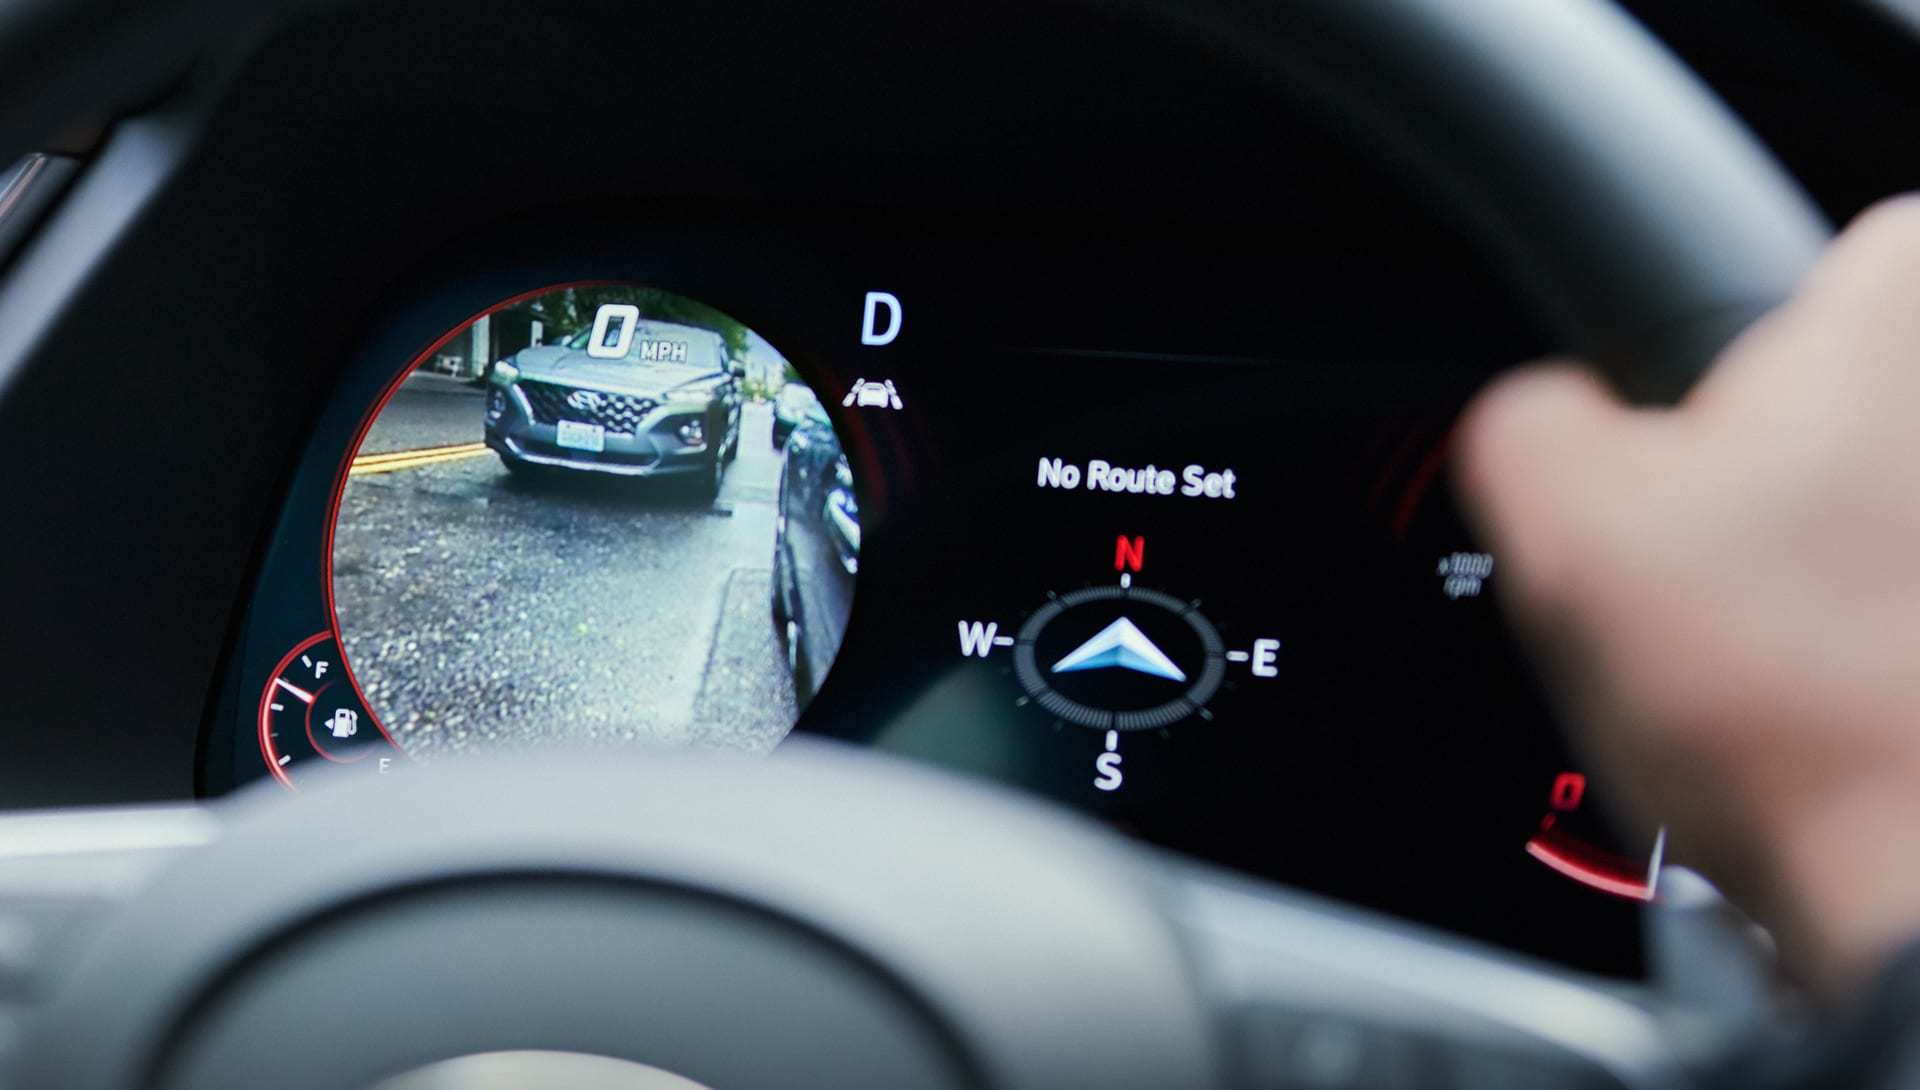 Blind-Spot View Monitor in the 2020 Hyundai Sonata